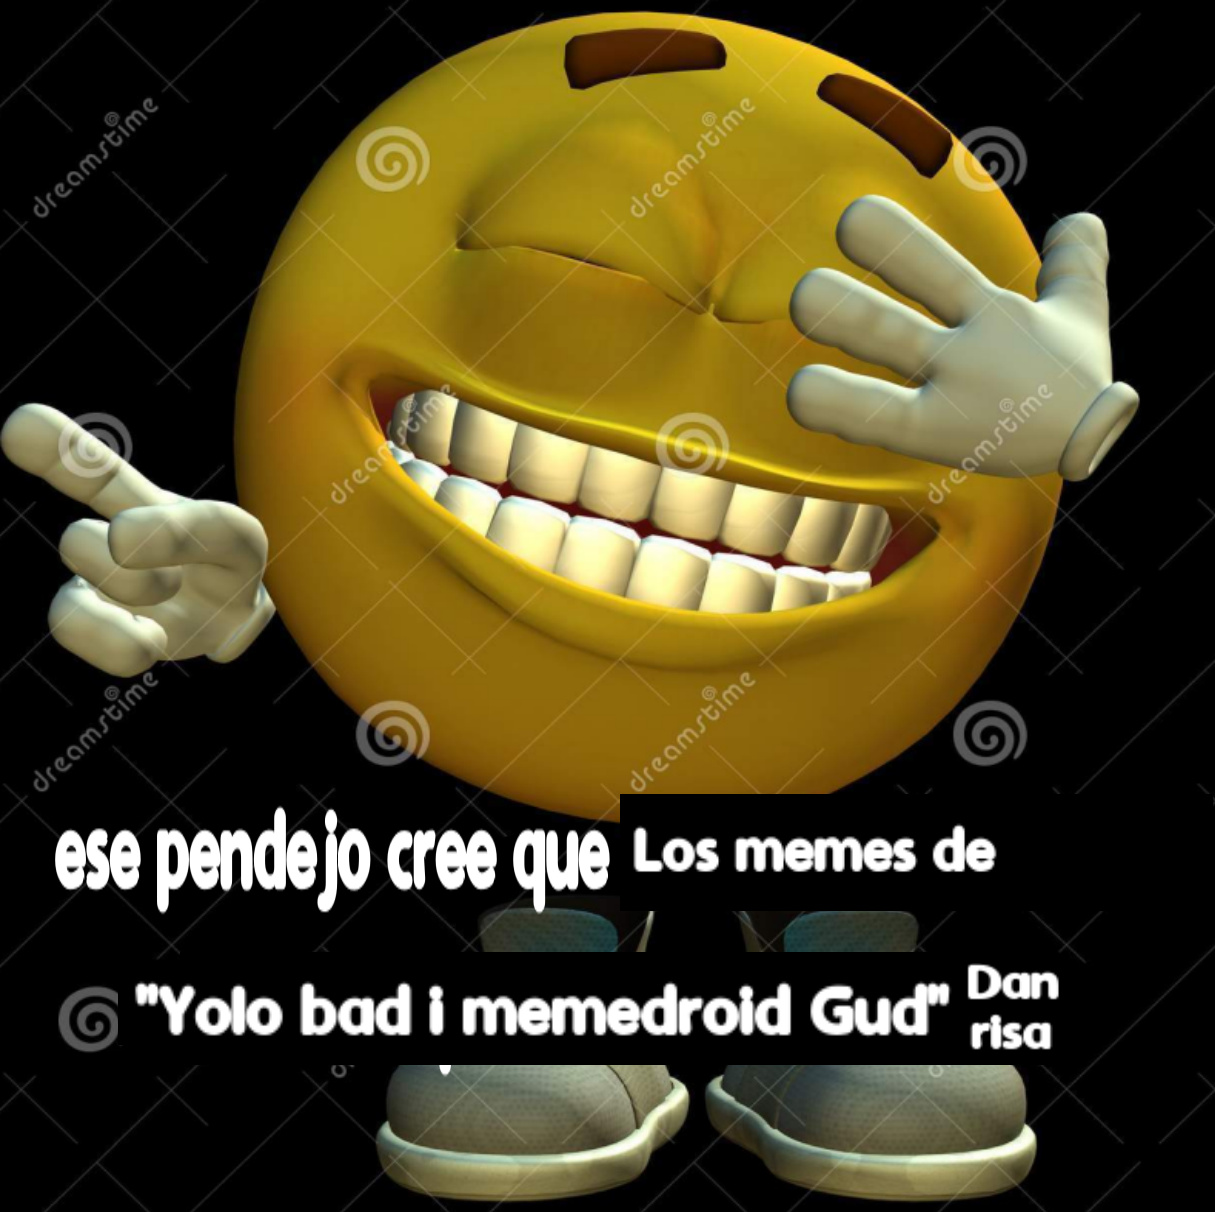 Memedroid gud